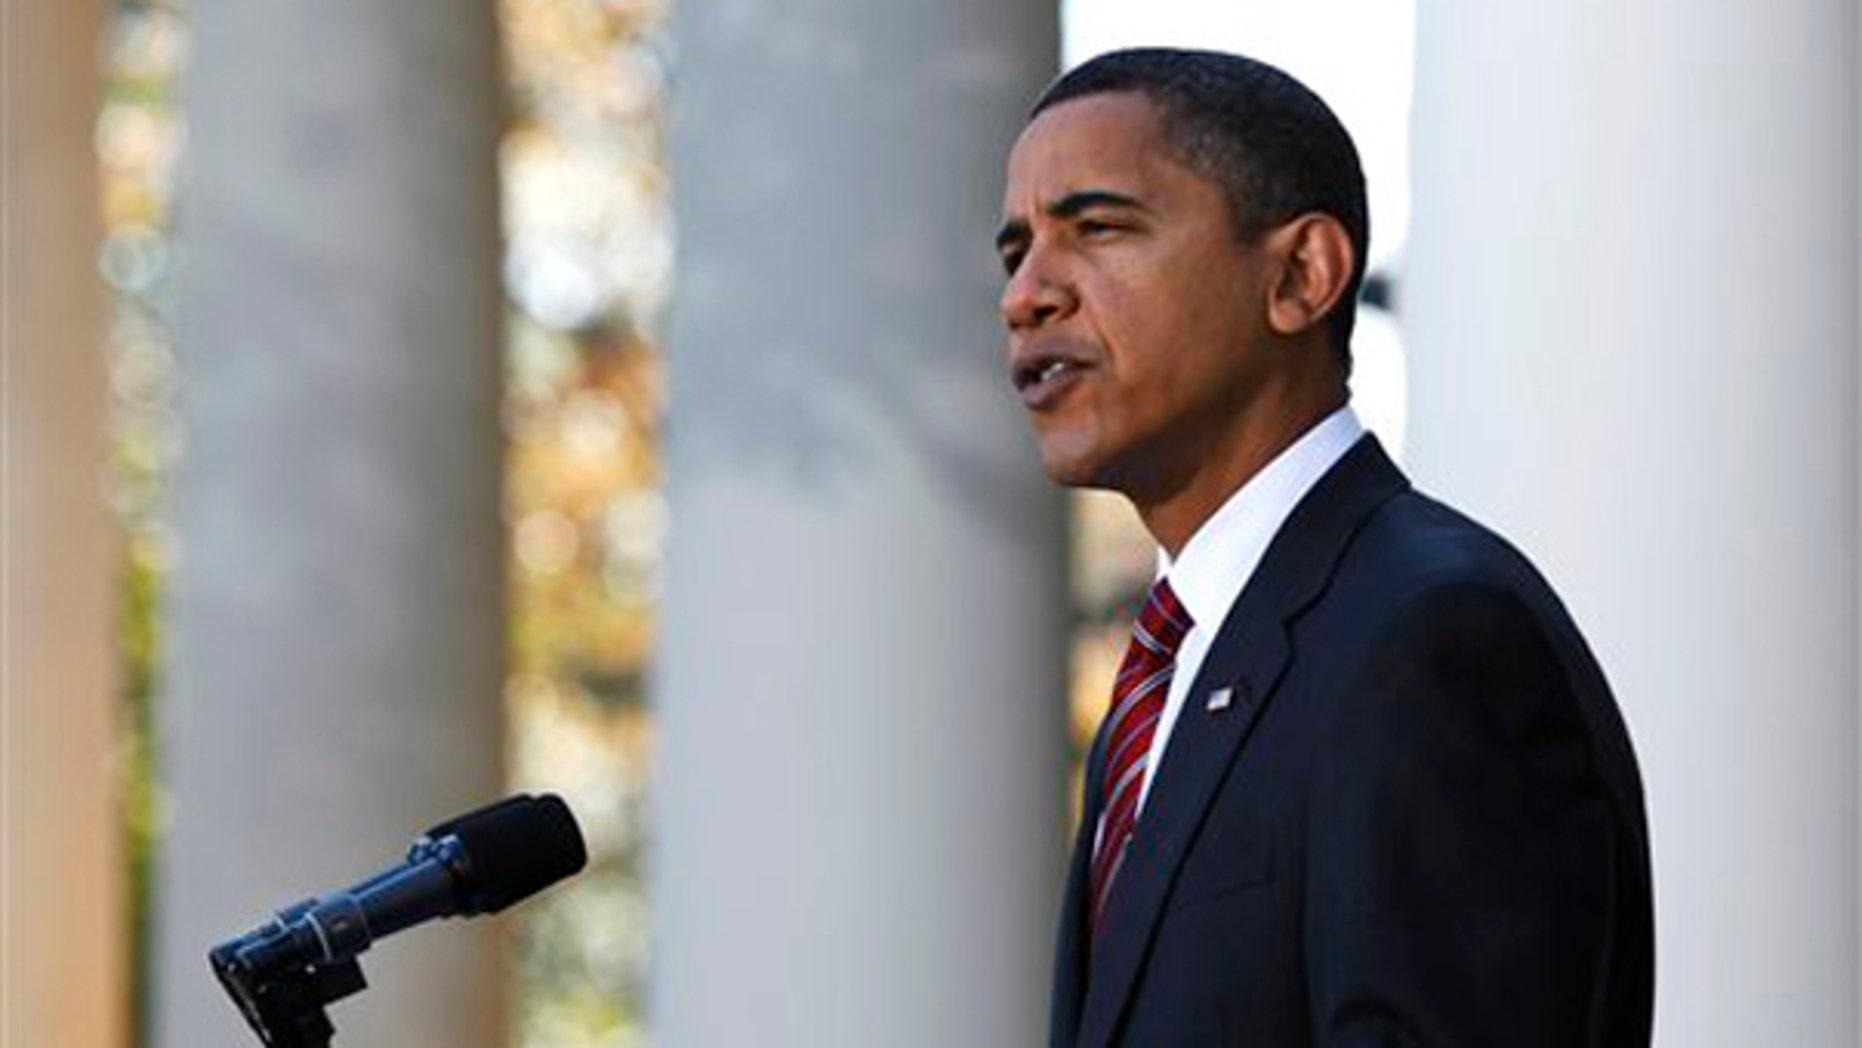 President Obama speaks in the Rose Garden about health care reform Nov. 8. (AP Photo)